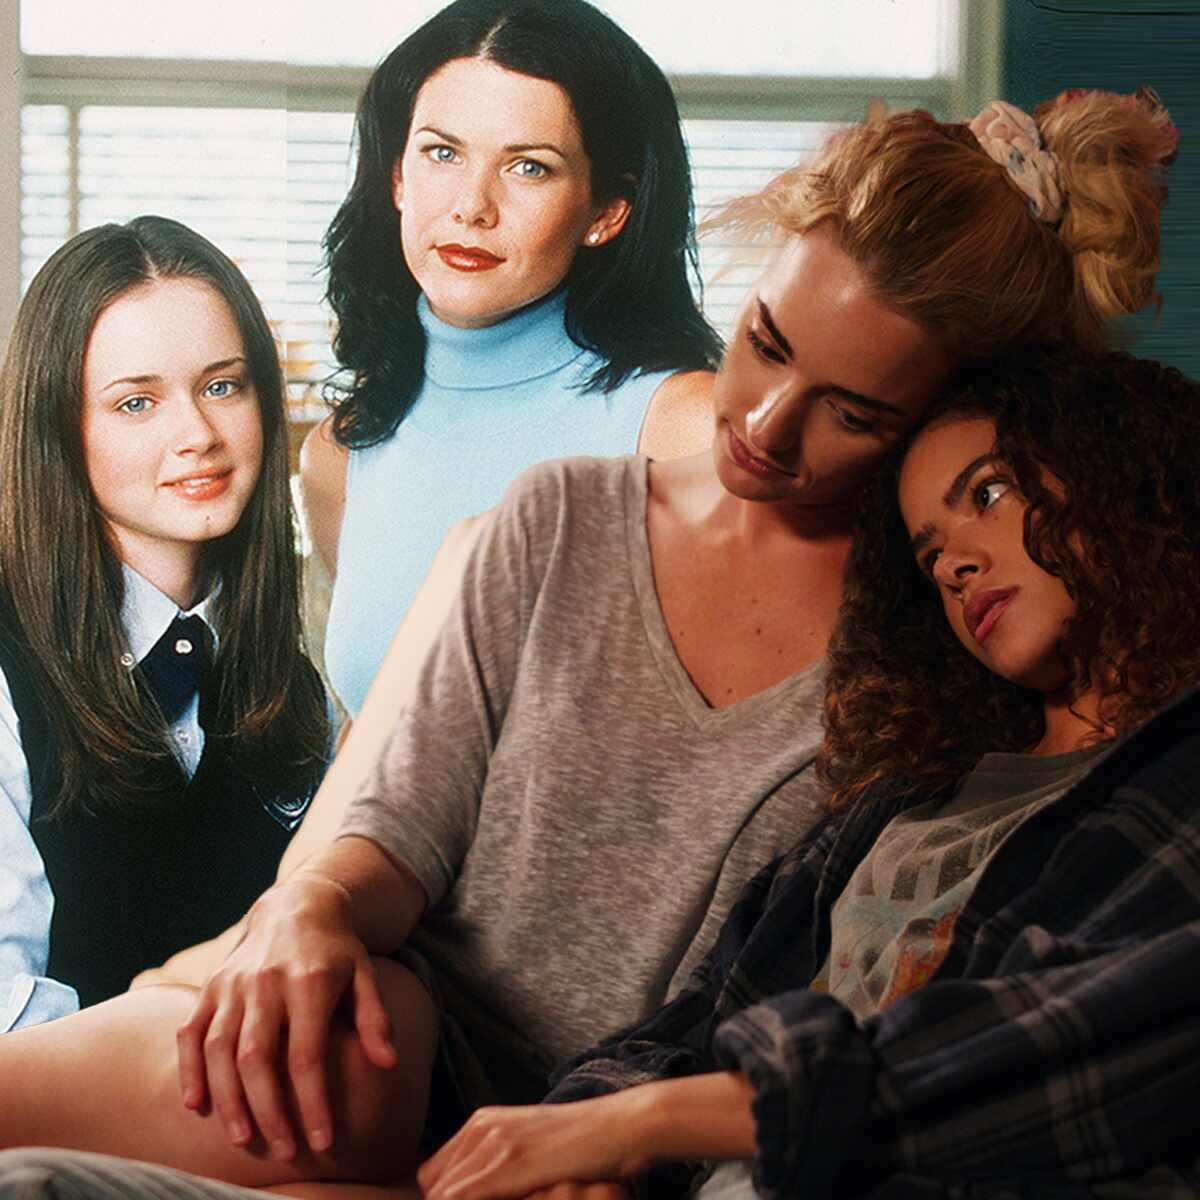 Ginny & Georgia and Gilmore Girls Comparisons